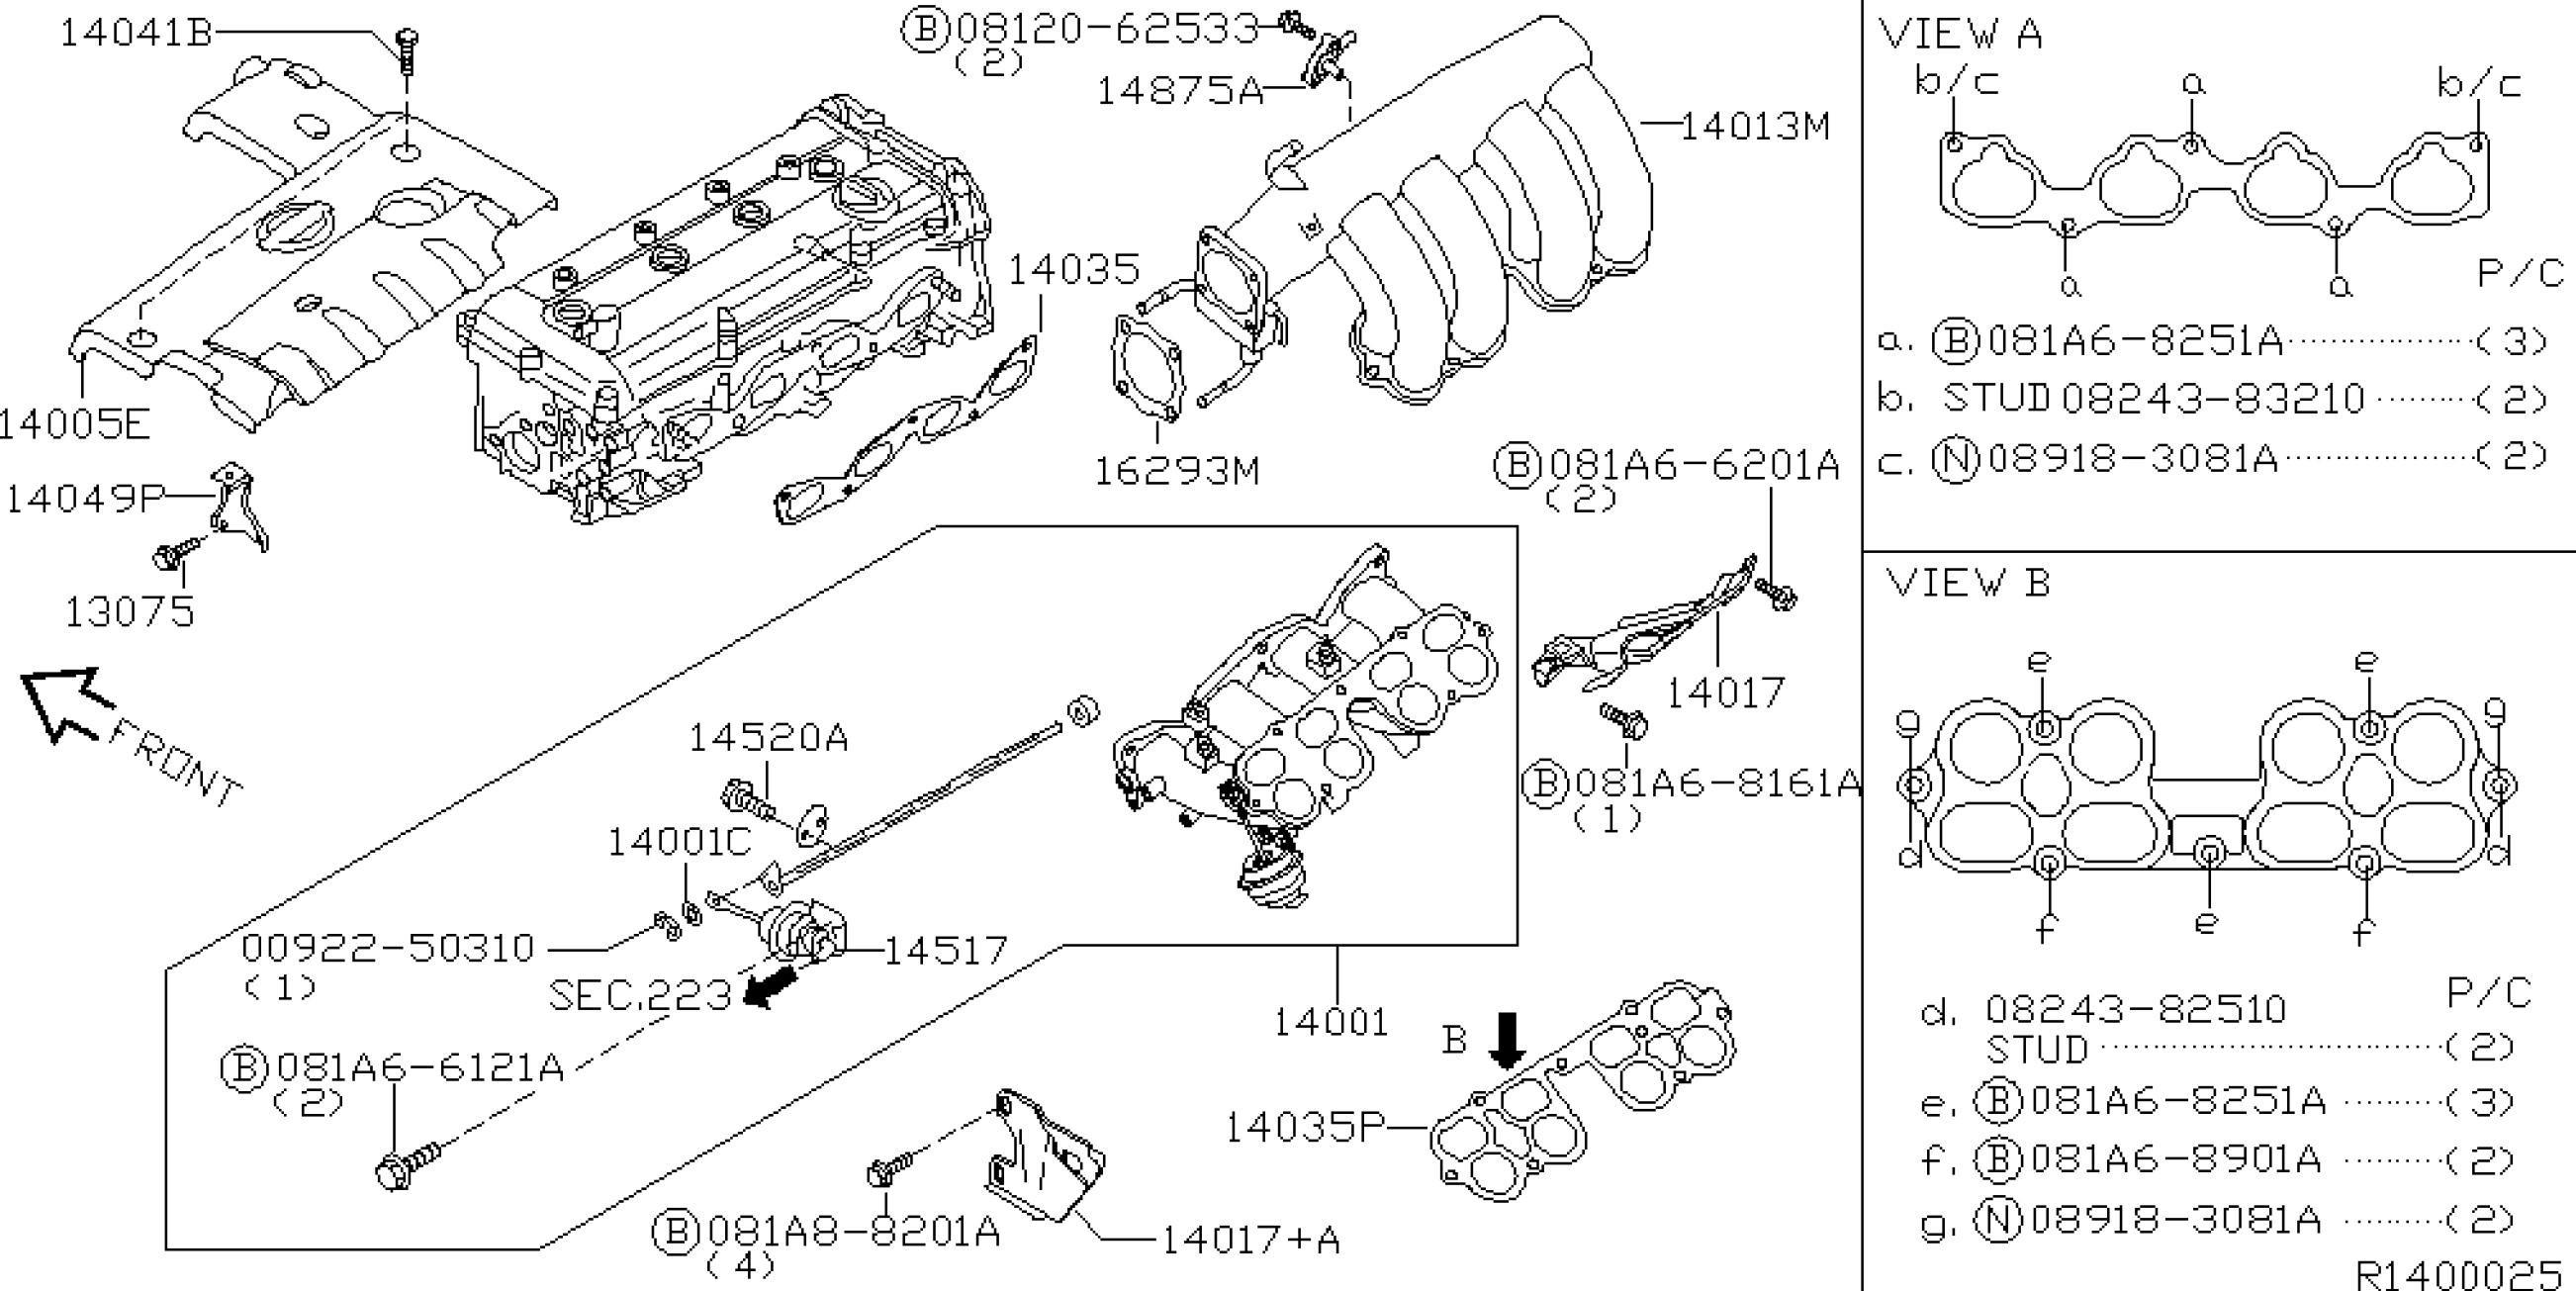 1997 nissan altima engine diagram 2004 ford f250 lariat radio wiring library 2002 sentra 2007 kia spectra of